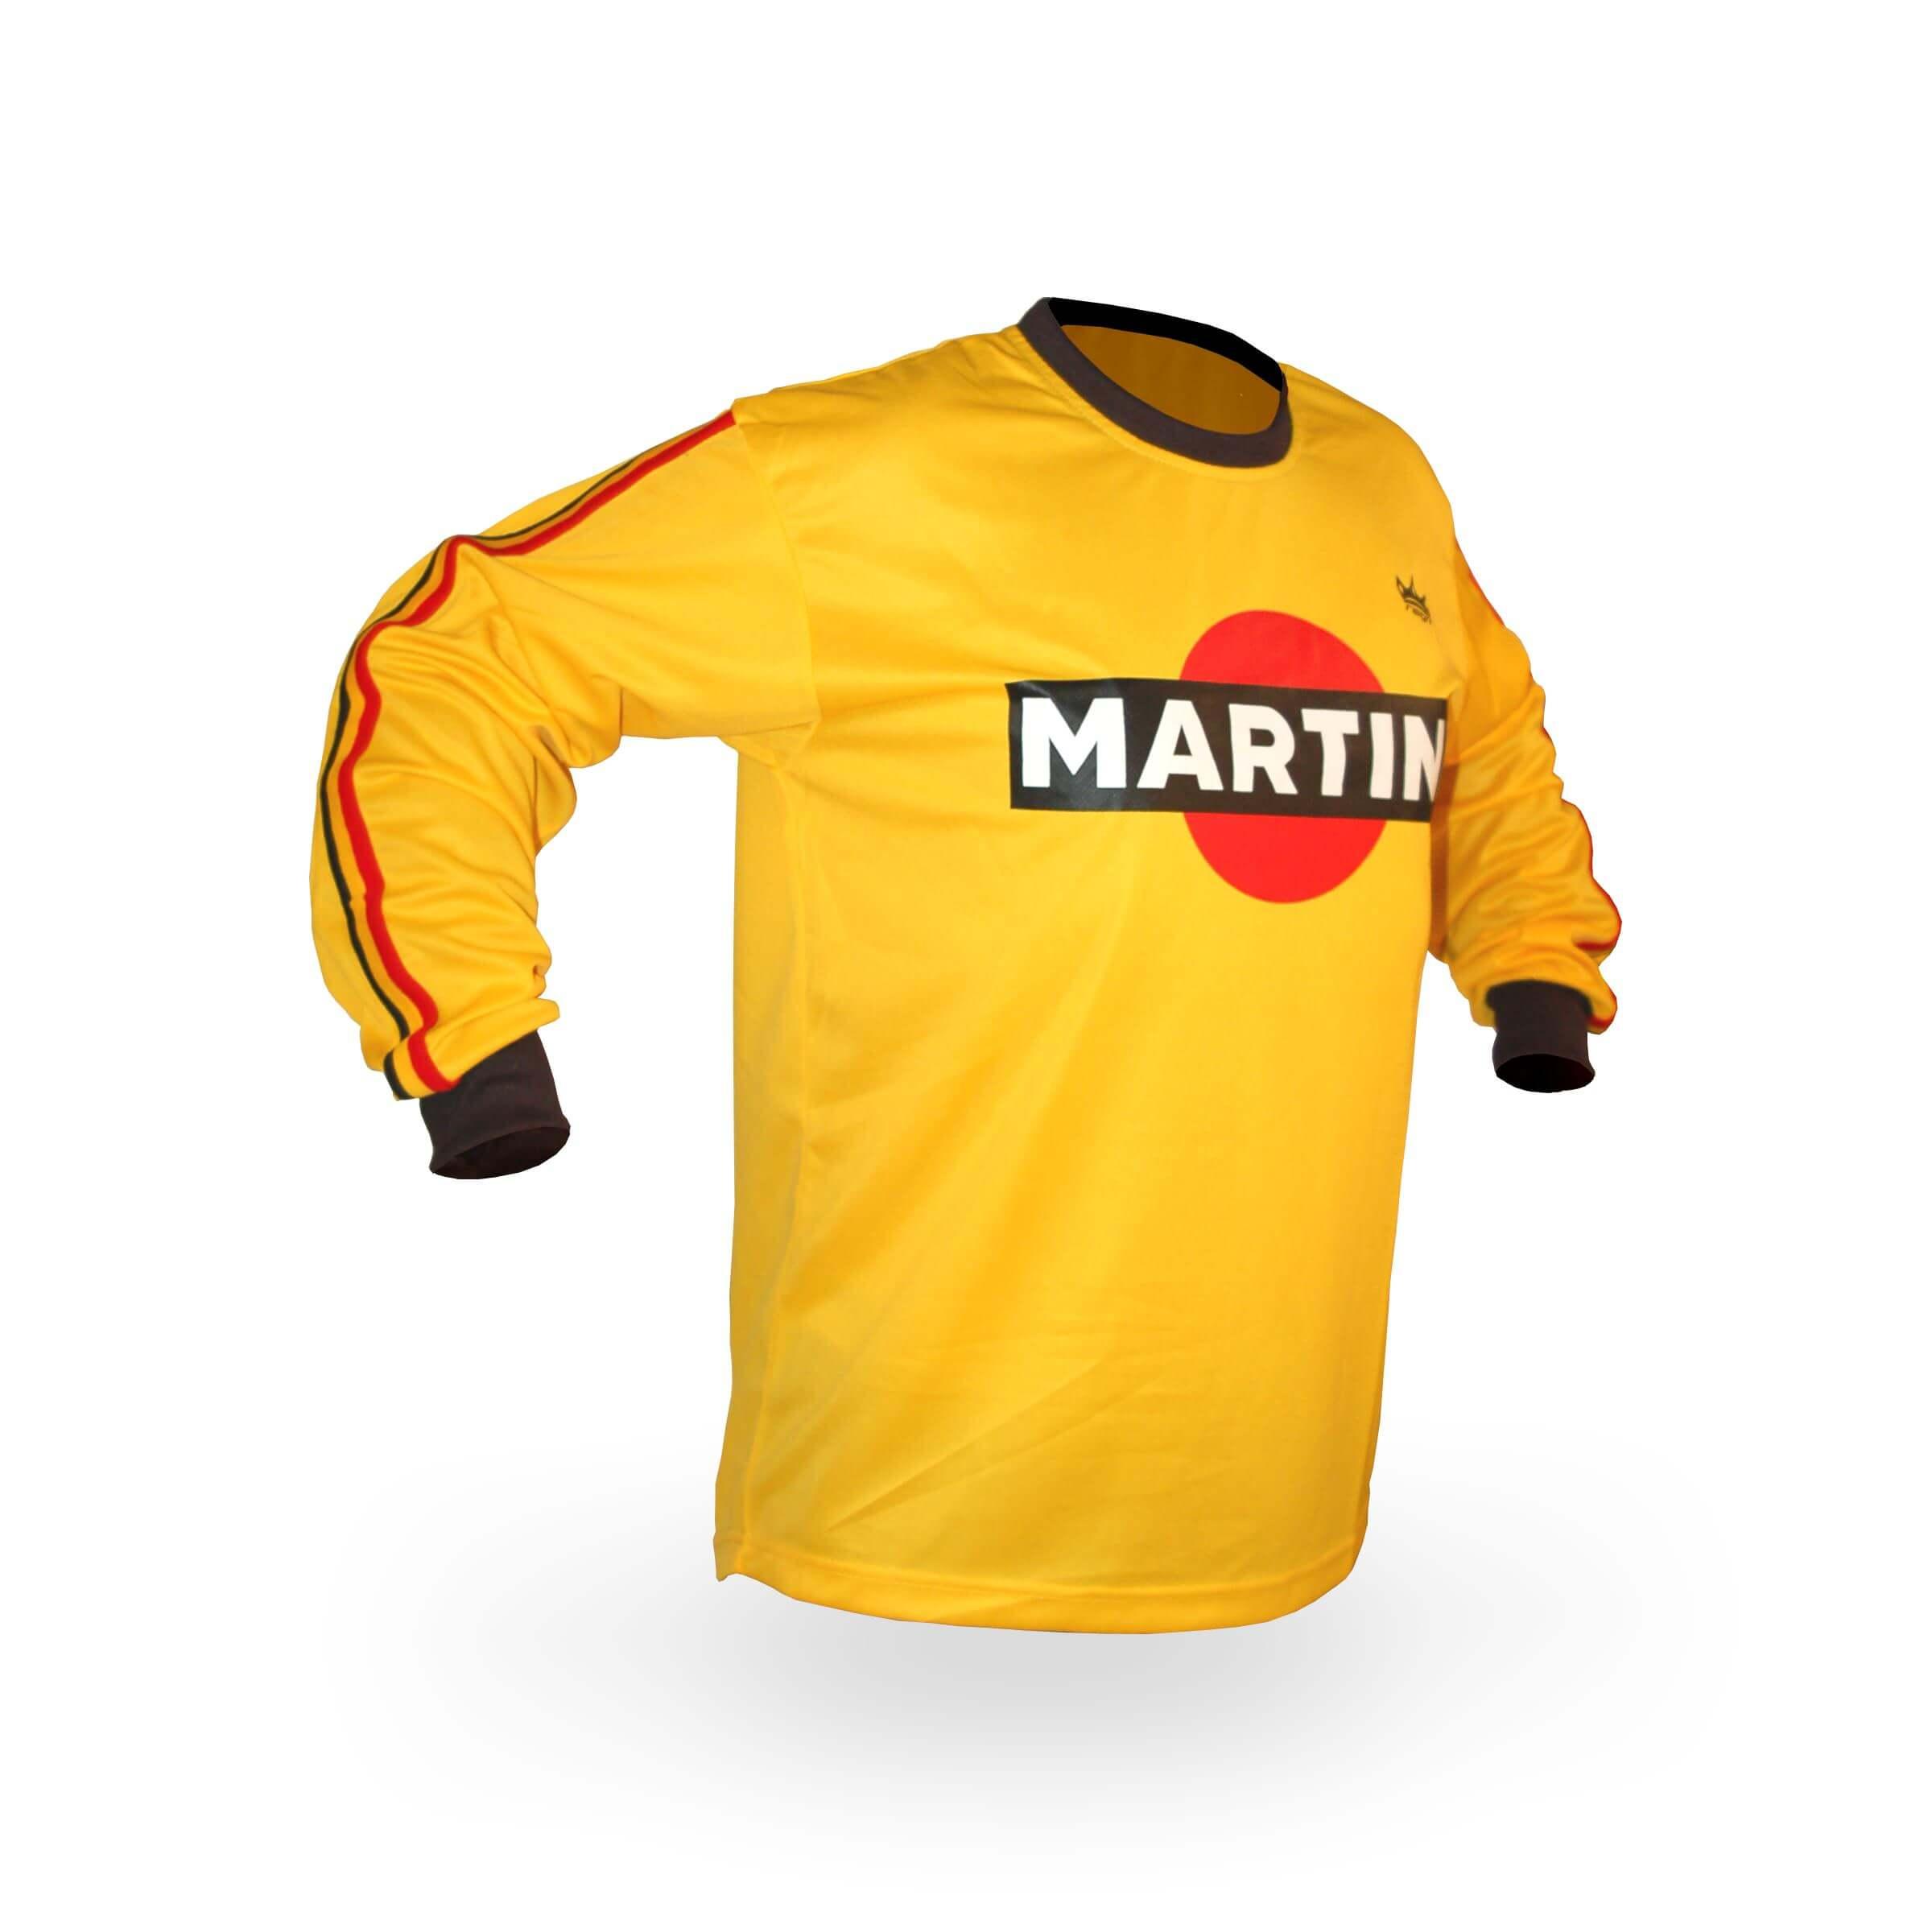 Martini-MX-Jersey